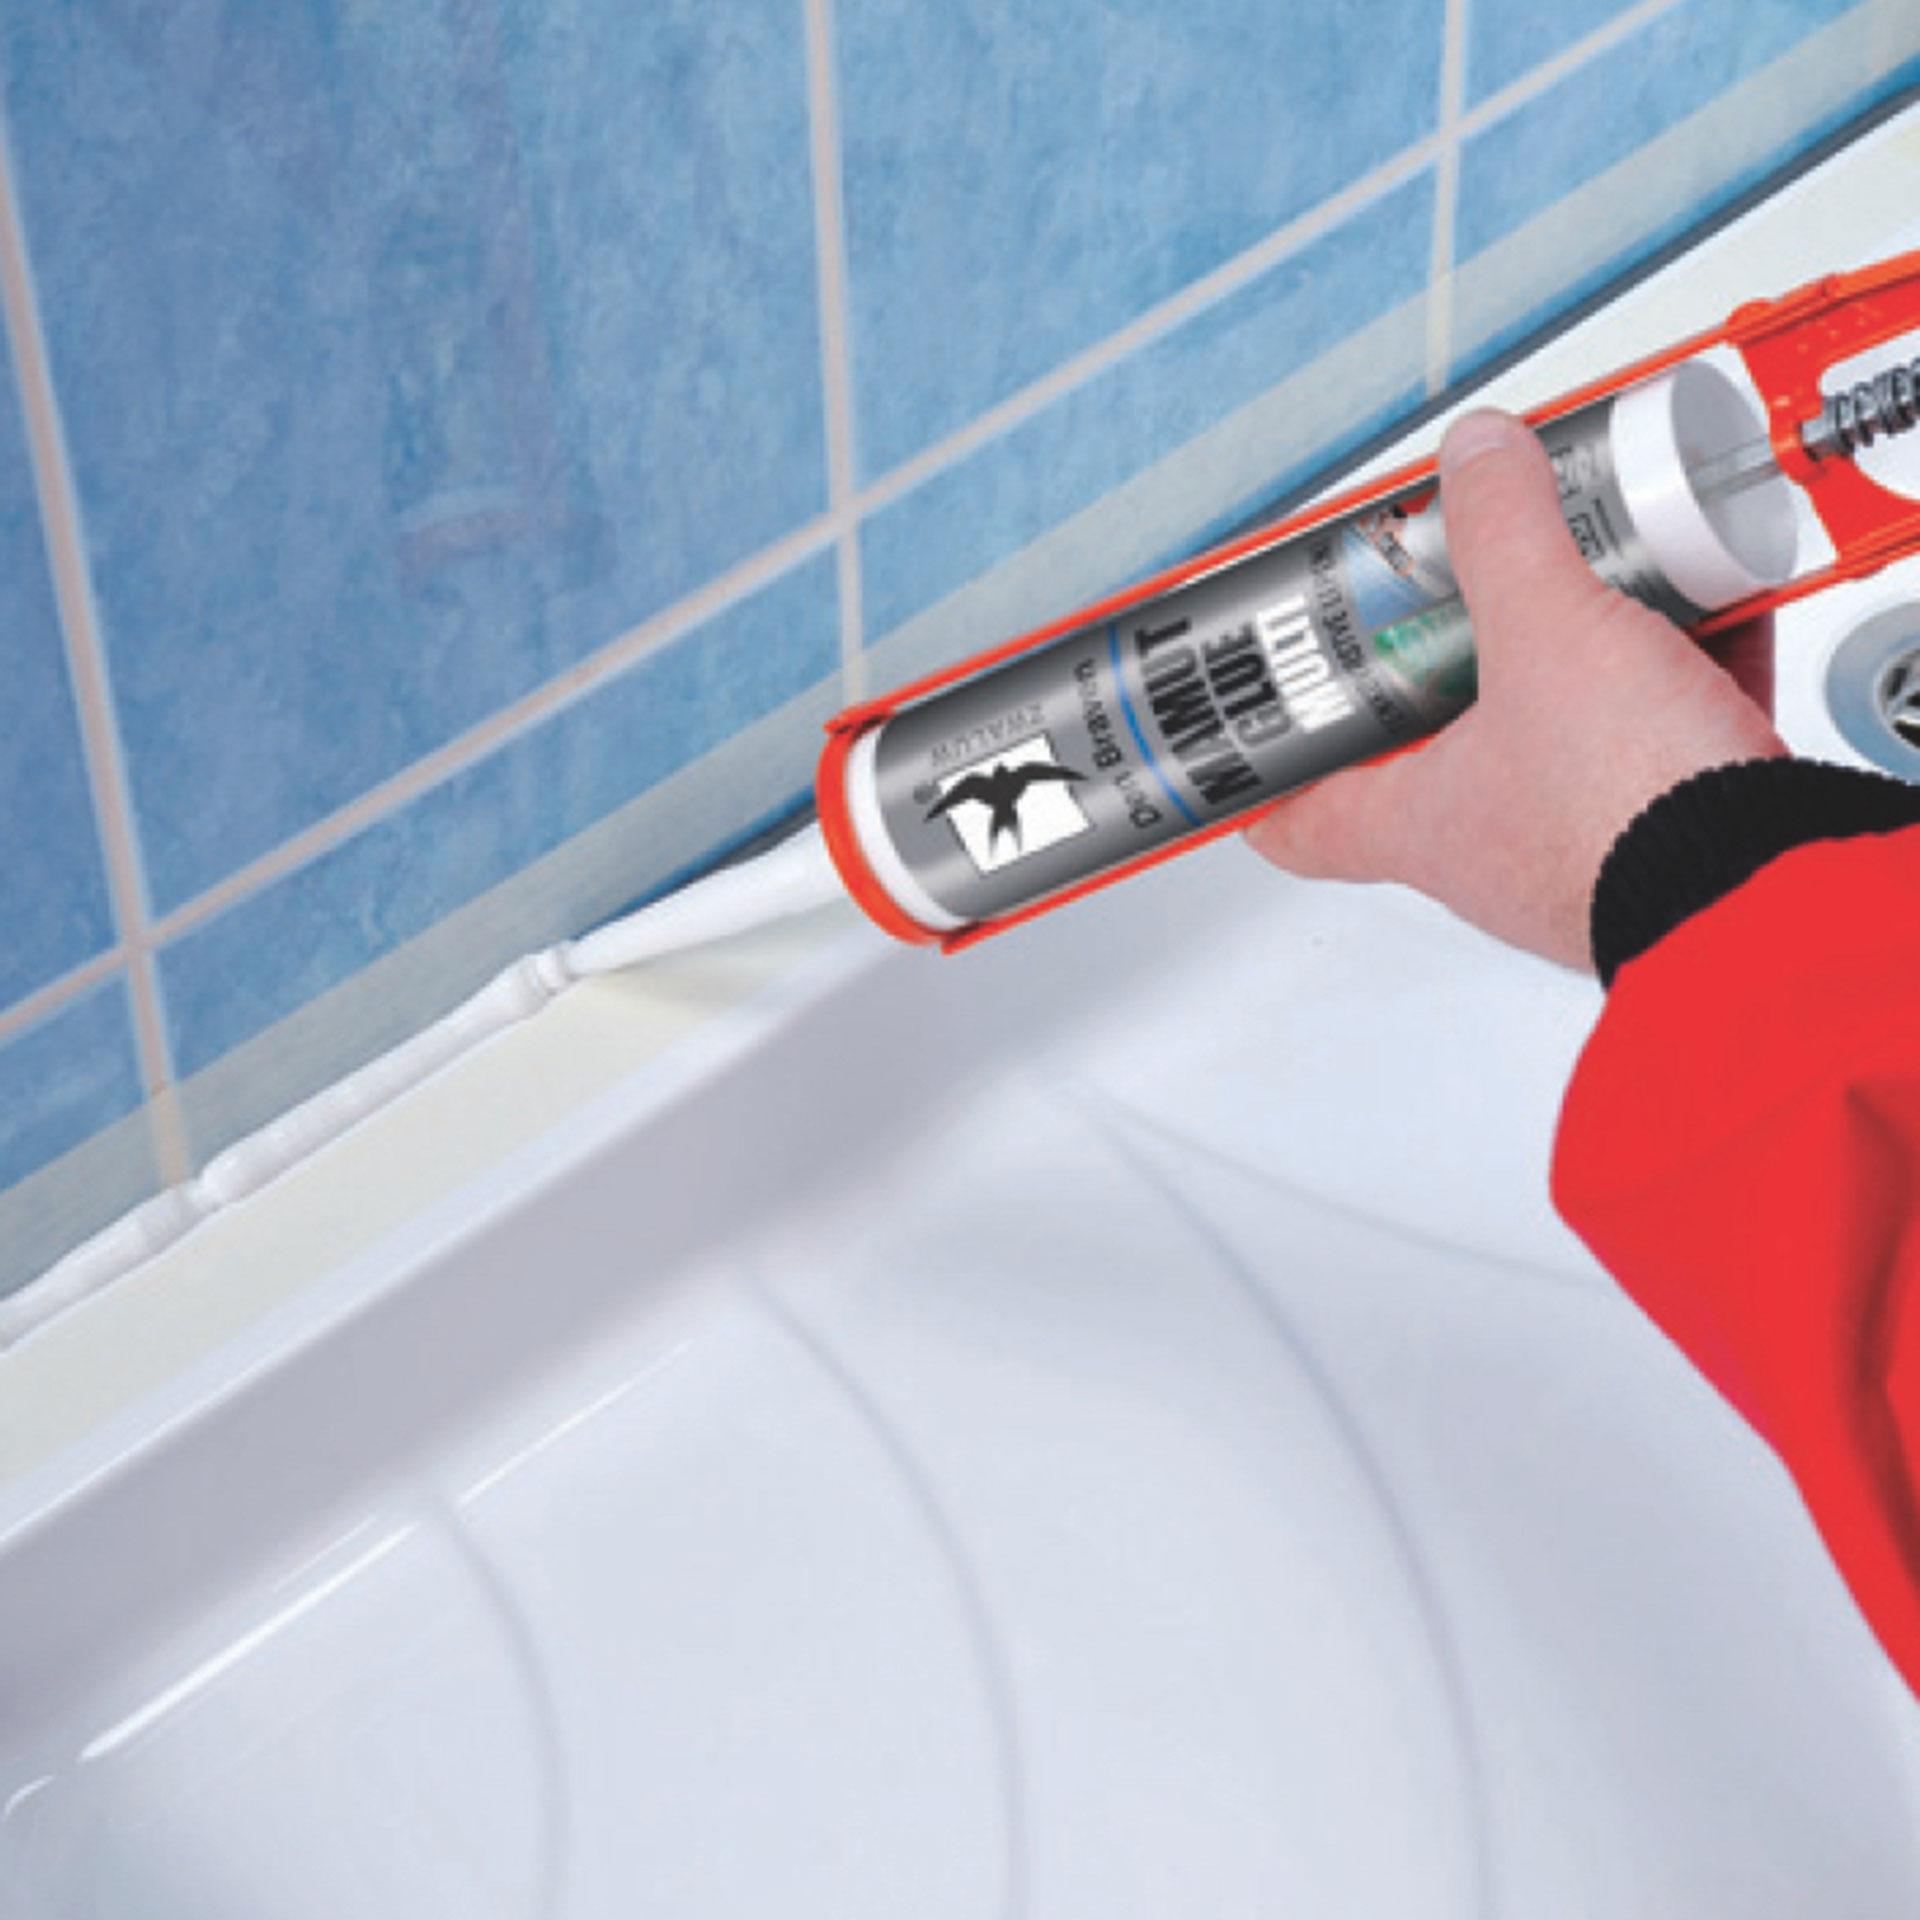 Bostik DIY Greece Grab Adhesives Mamut Glue Mult Application 1